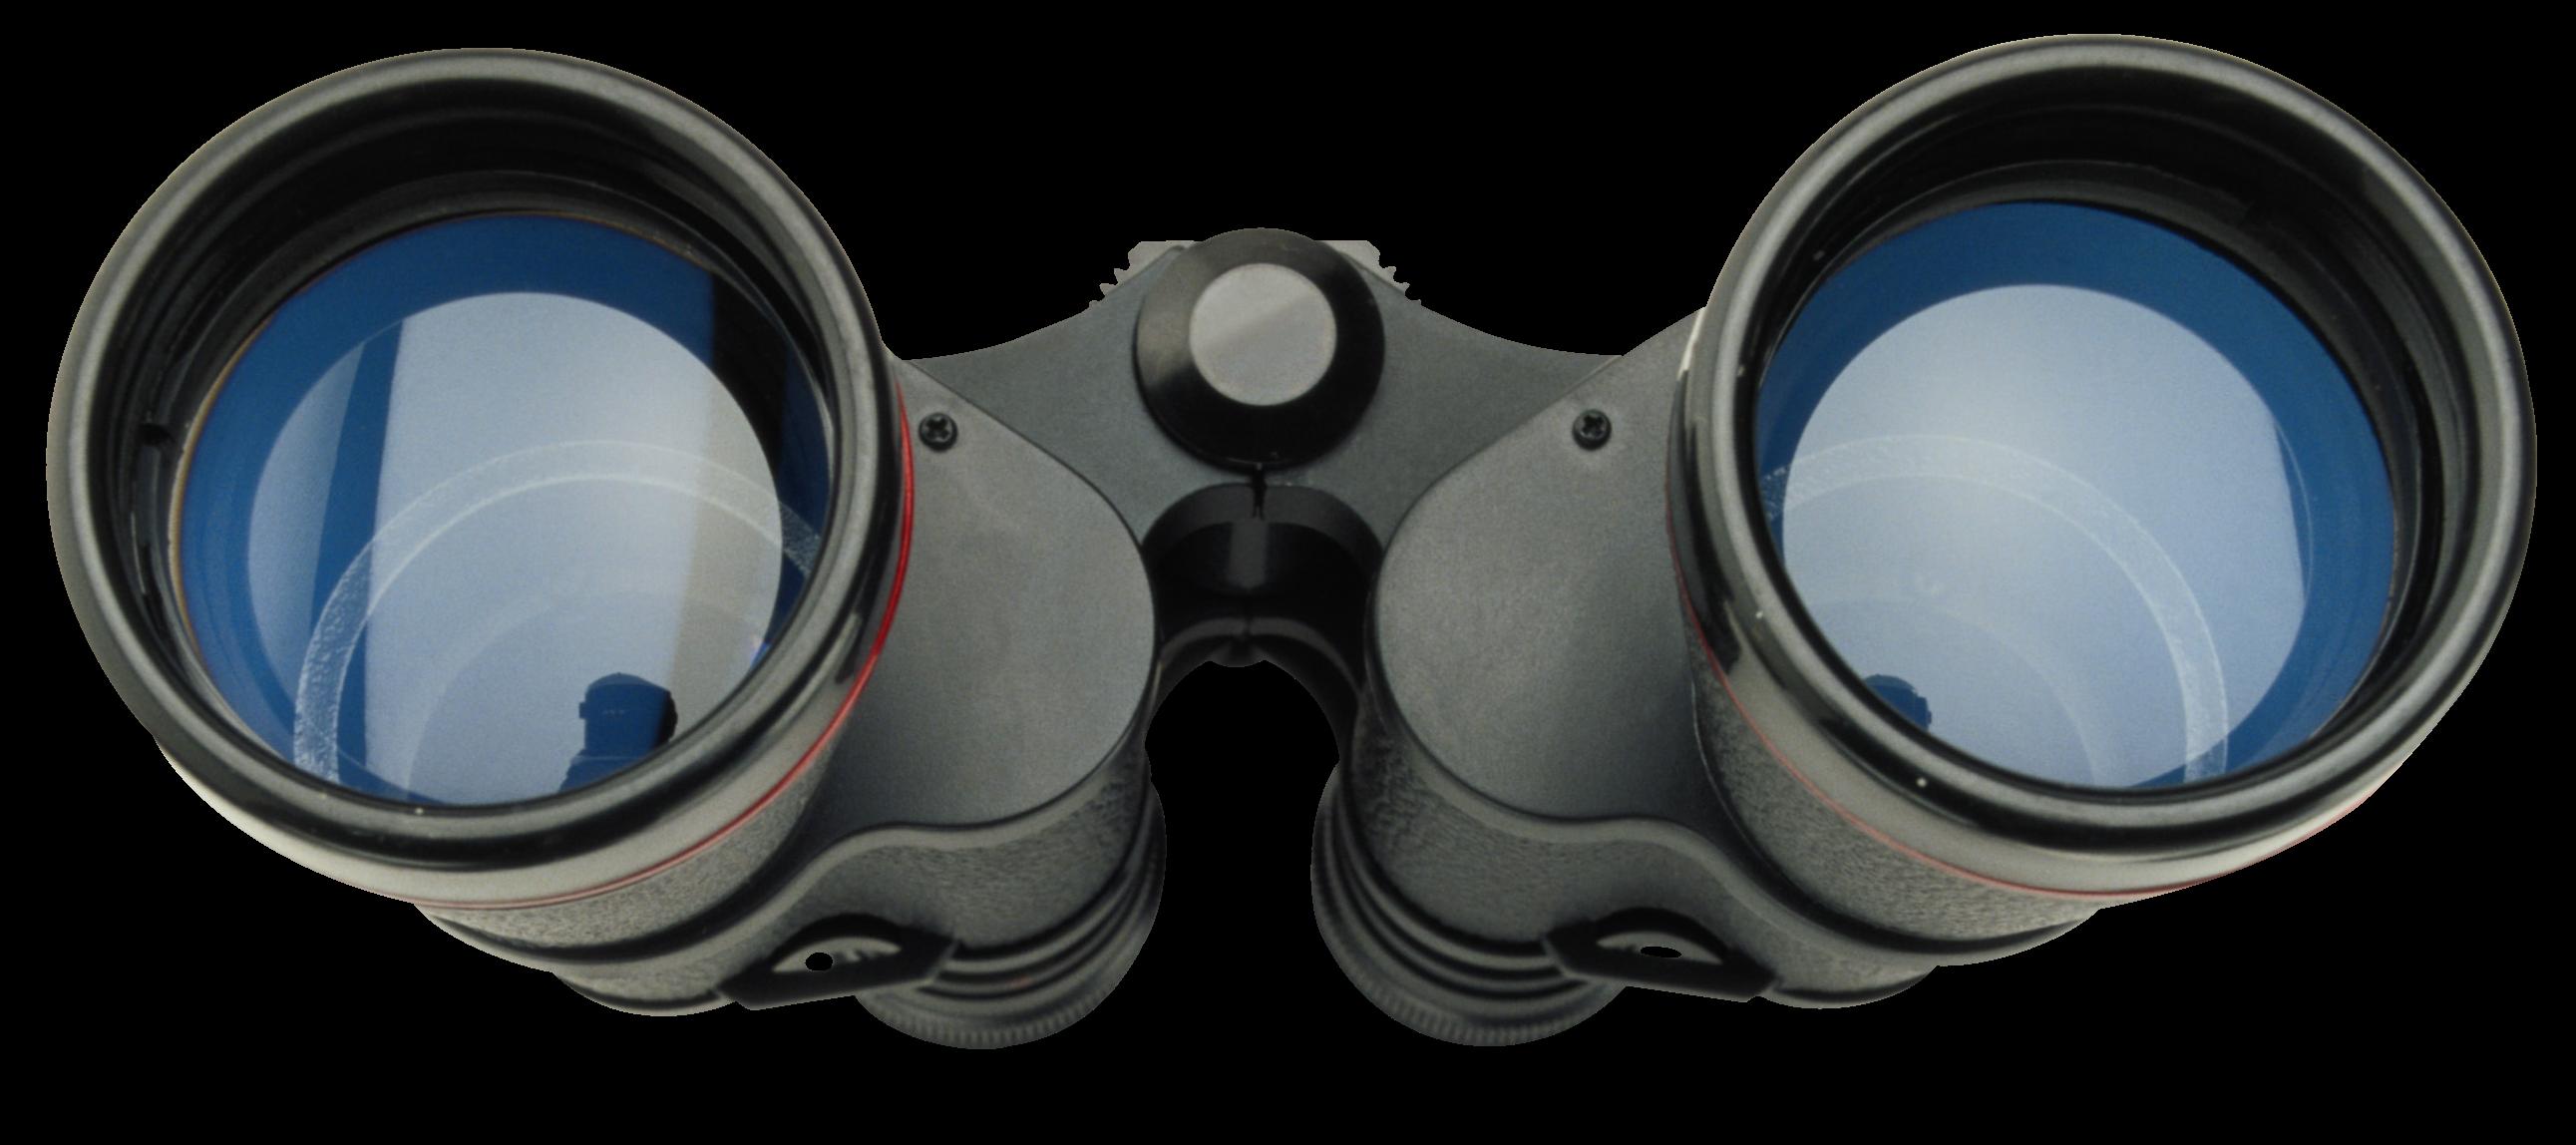 binoculars view png - photo #25